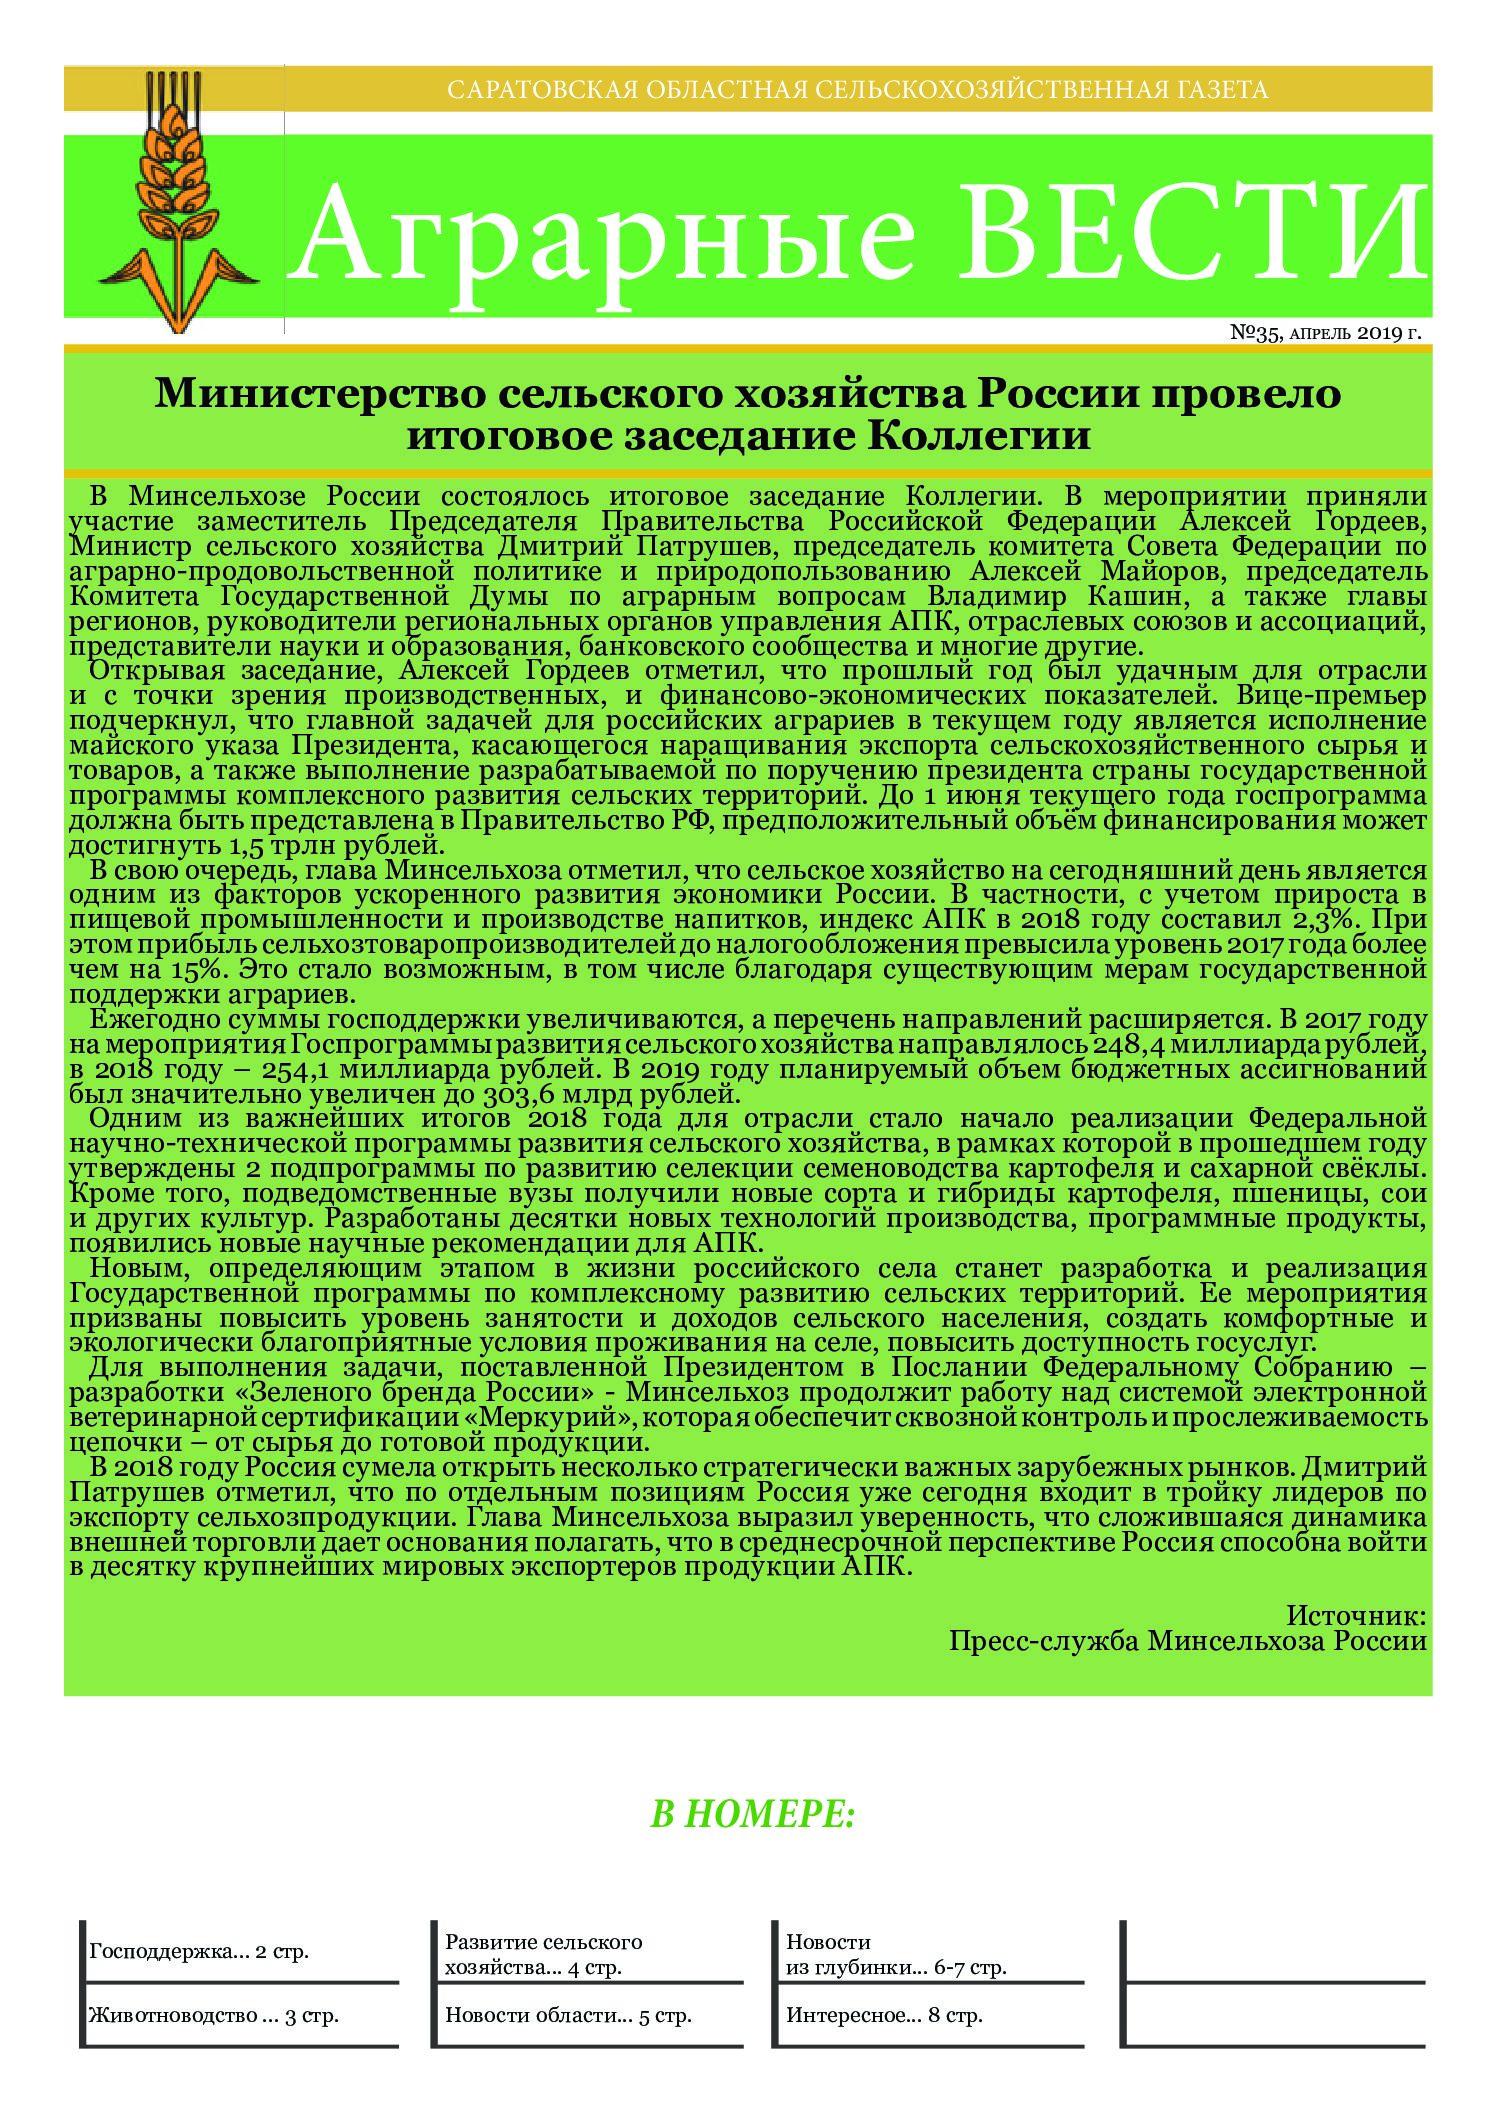 https://saratovagro.ru/wp-content/uploads/2020/08/35.2019-pdf.jpg